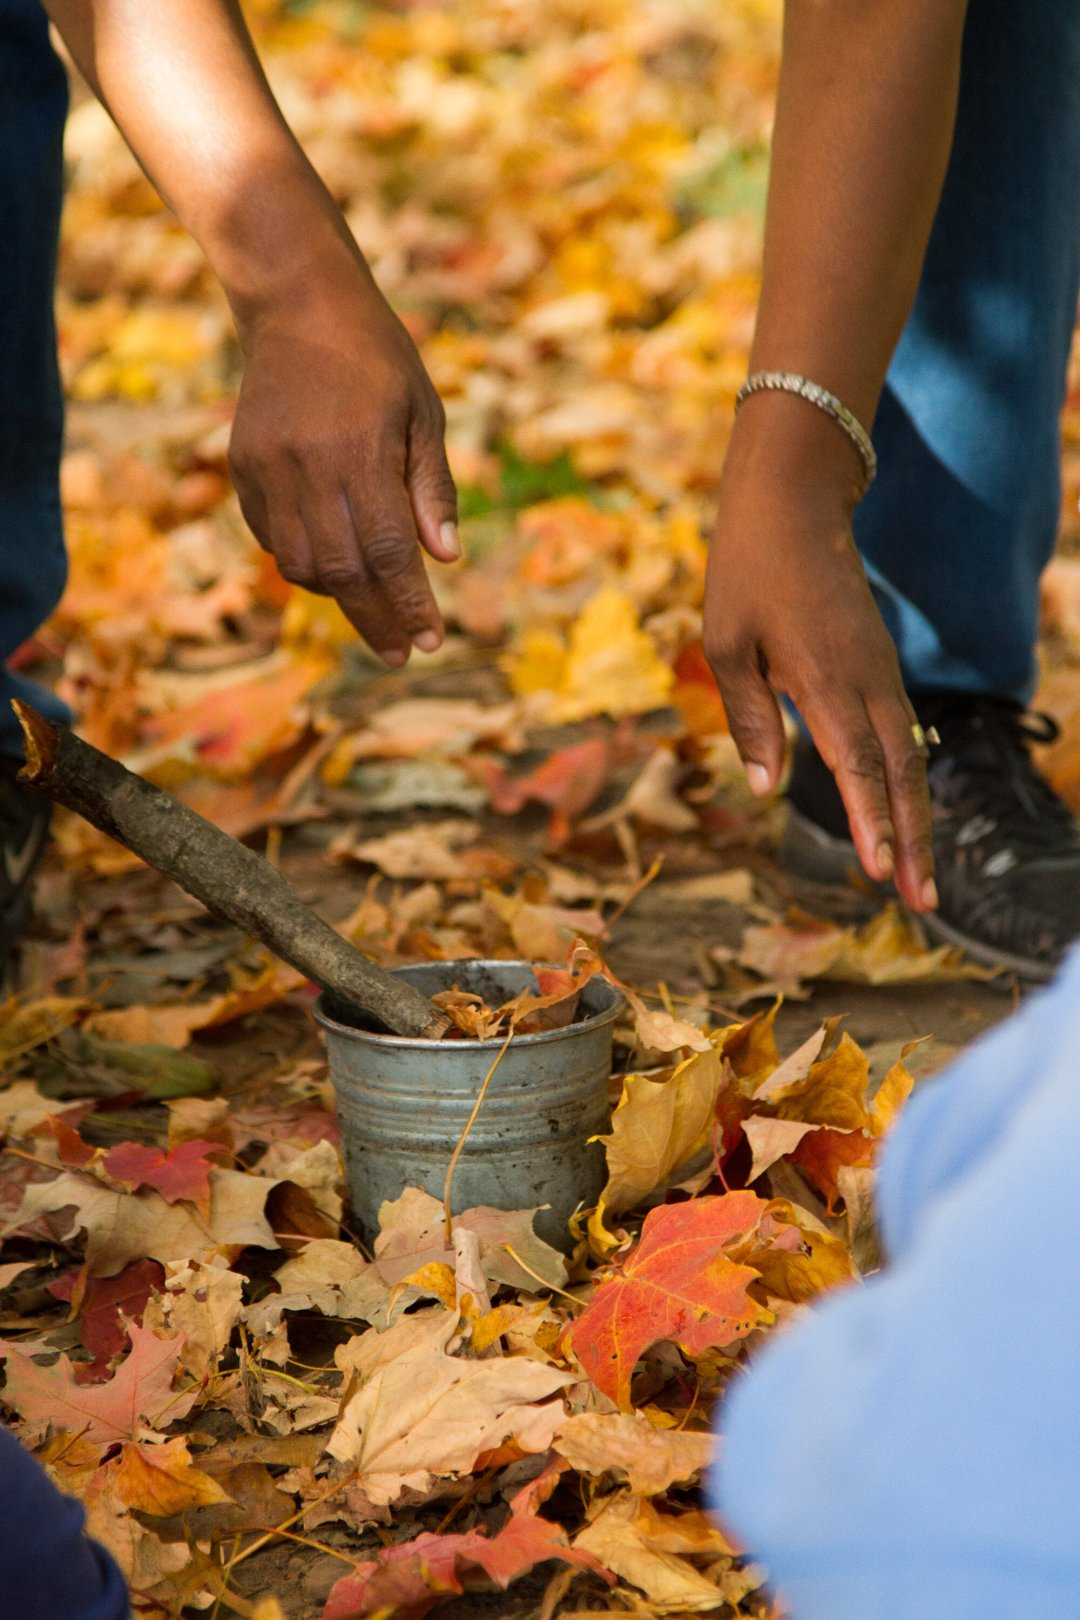 simple matters with joylynn holder of brooklyn forest school | reading my tea leaves